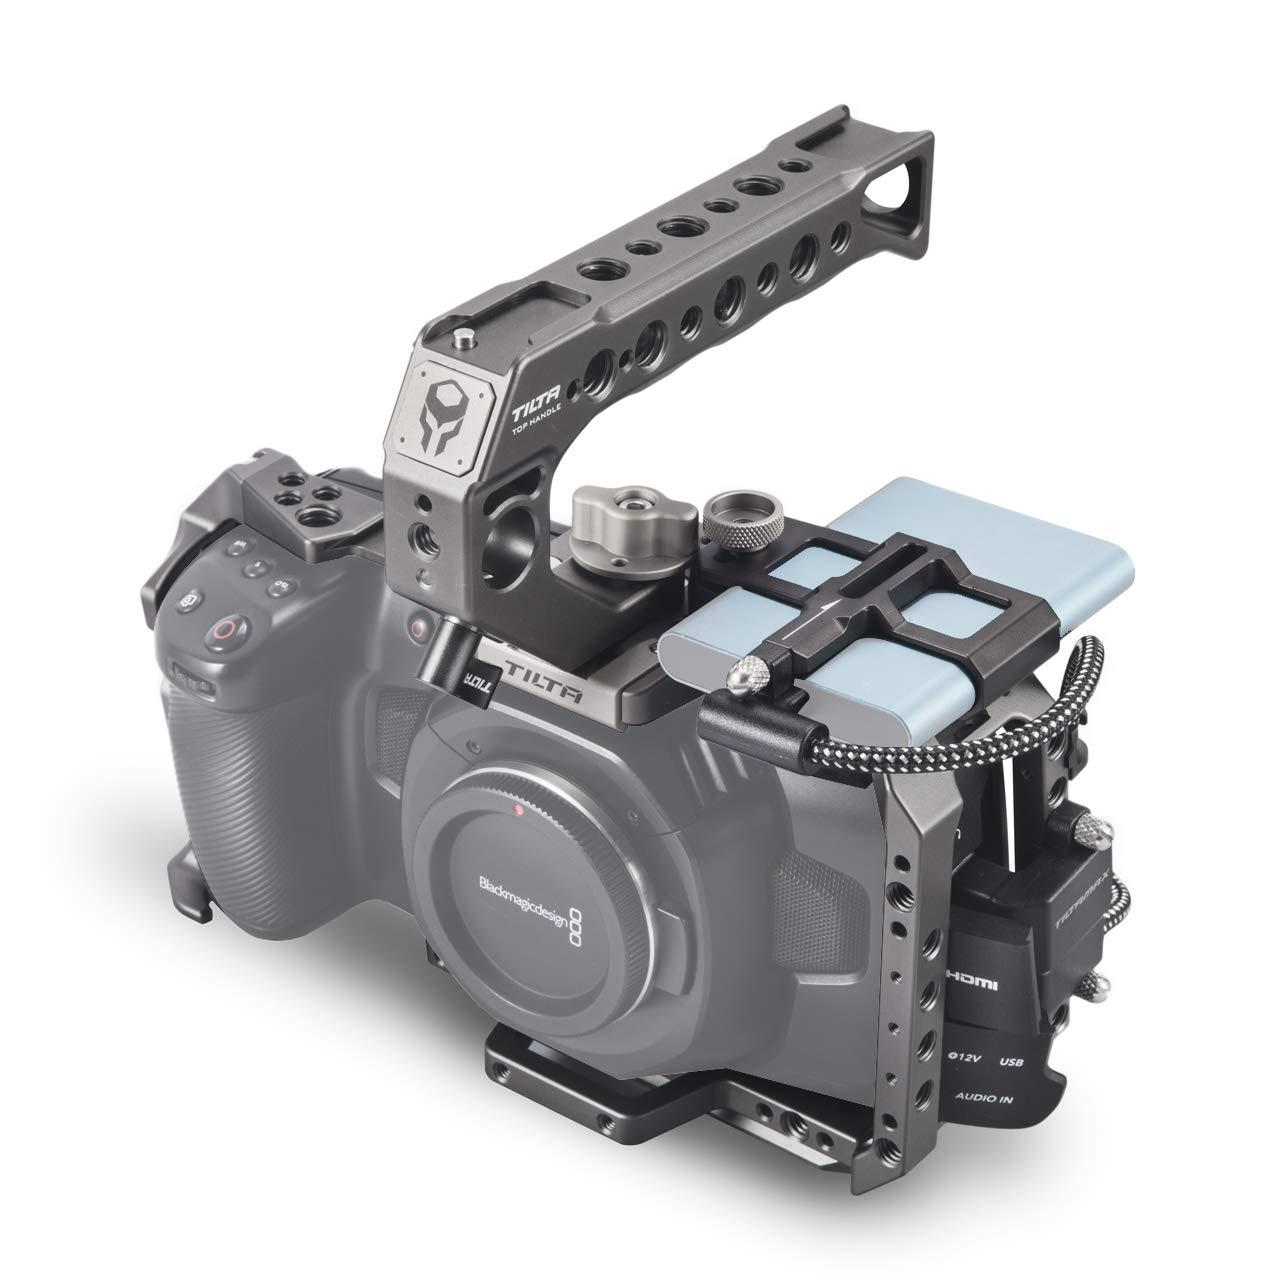 Кейдж Tilta Camera Cage for Blackmagic Design Pocket Cinema Camera 4K/6K (Basic Kit, Black / Gray) (TA-T01-B)